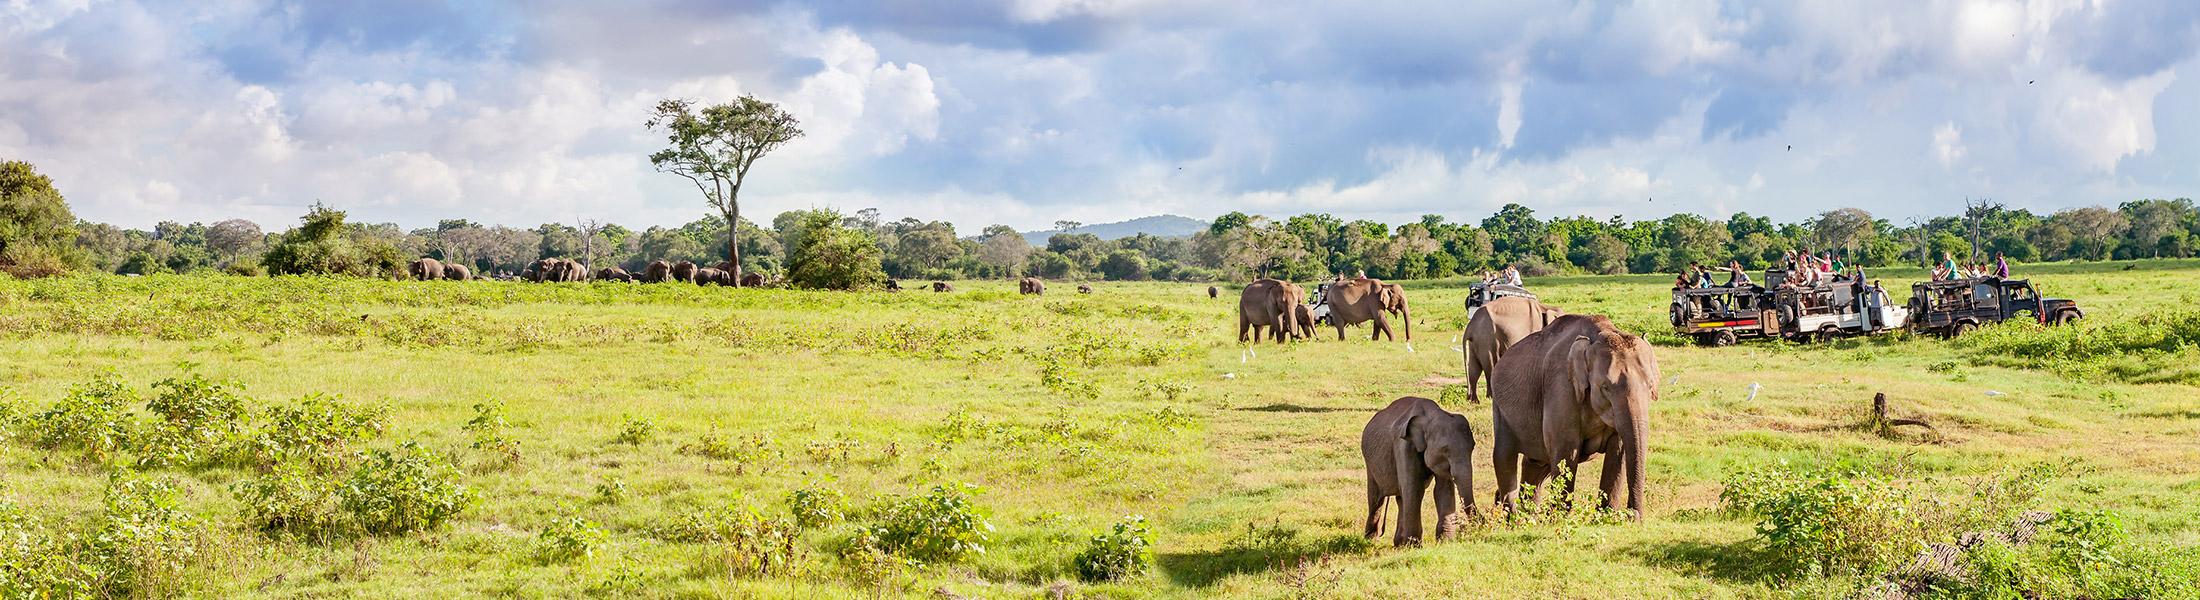 Elephants on Safari in Africa